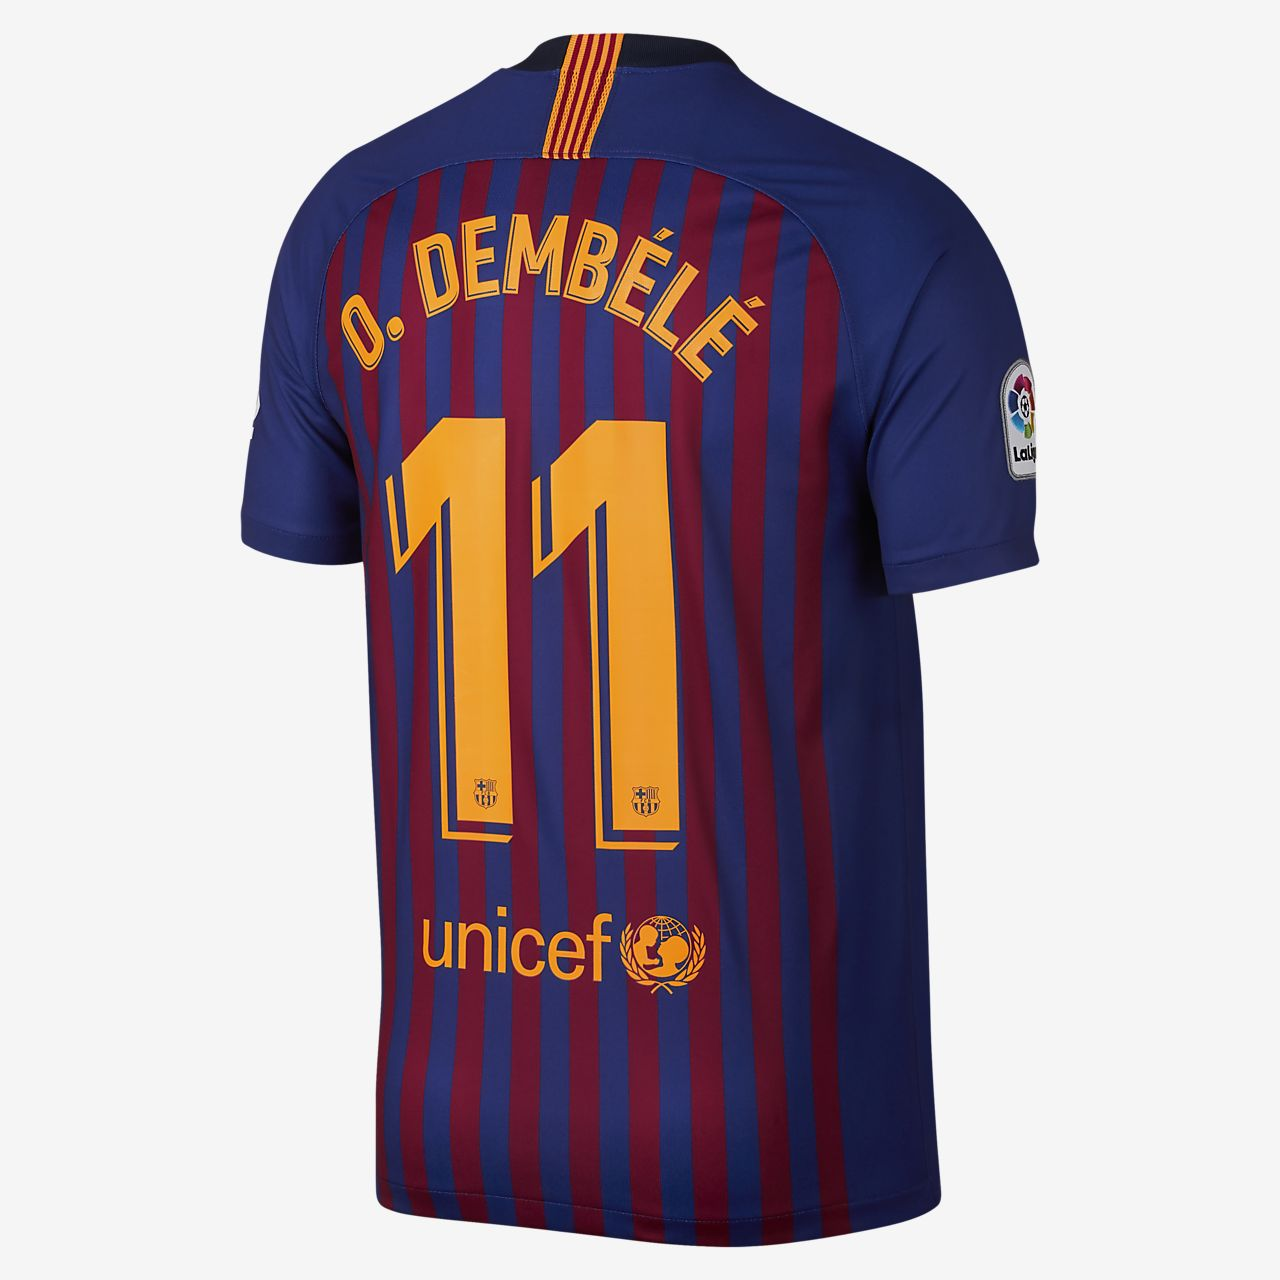 size 40 5831d c9051 2018/19 FC Barcelona Stadium Home (Ousmane Dembele) Men's Soccer Jersey